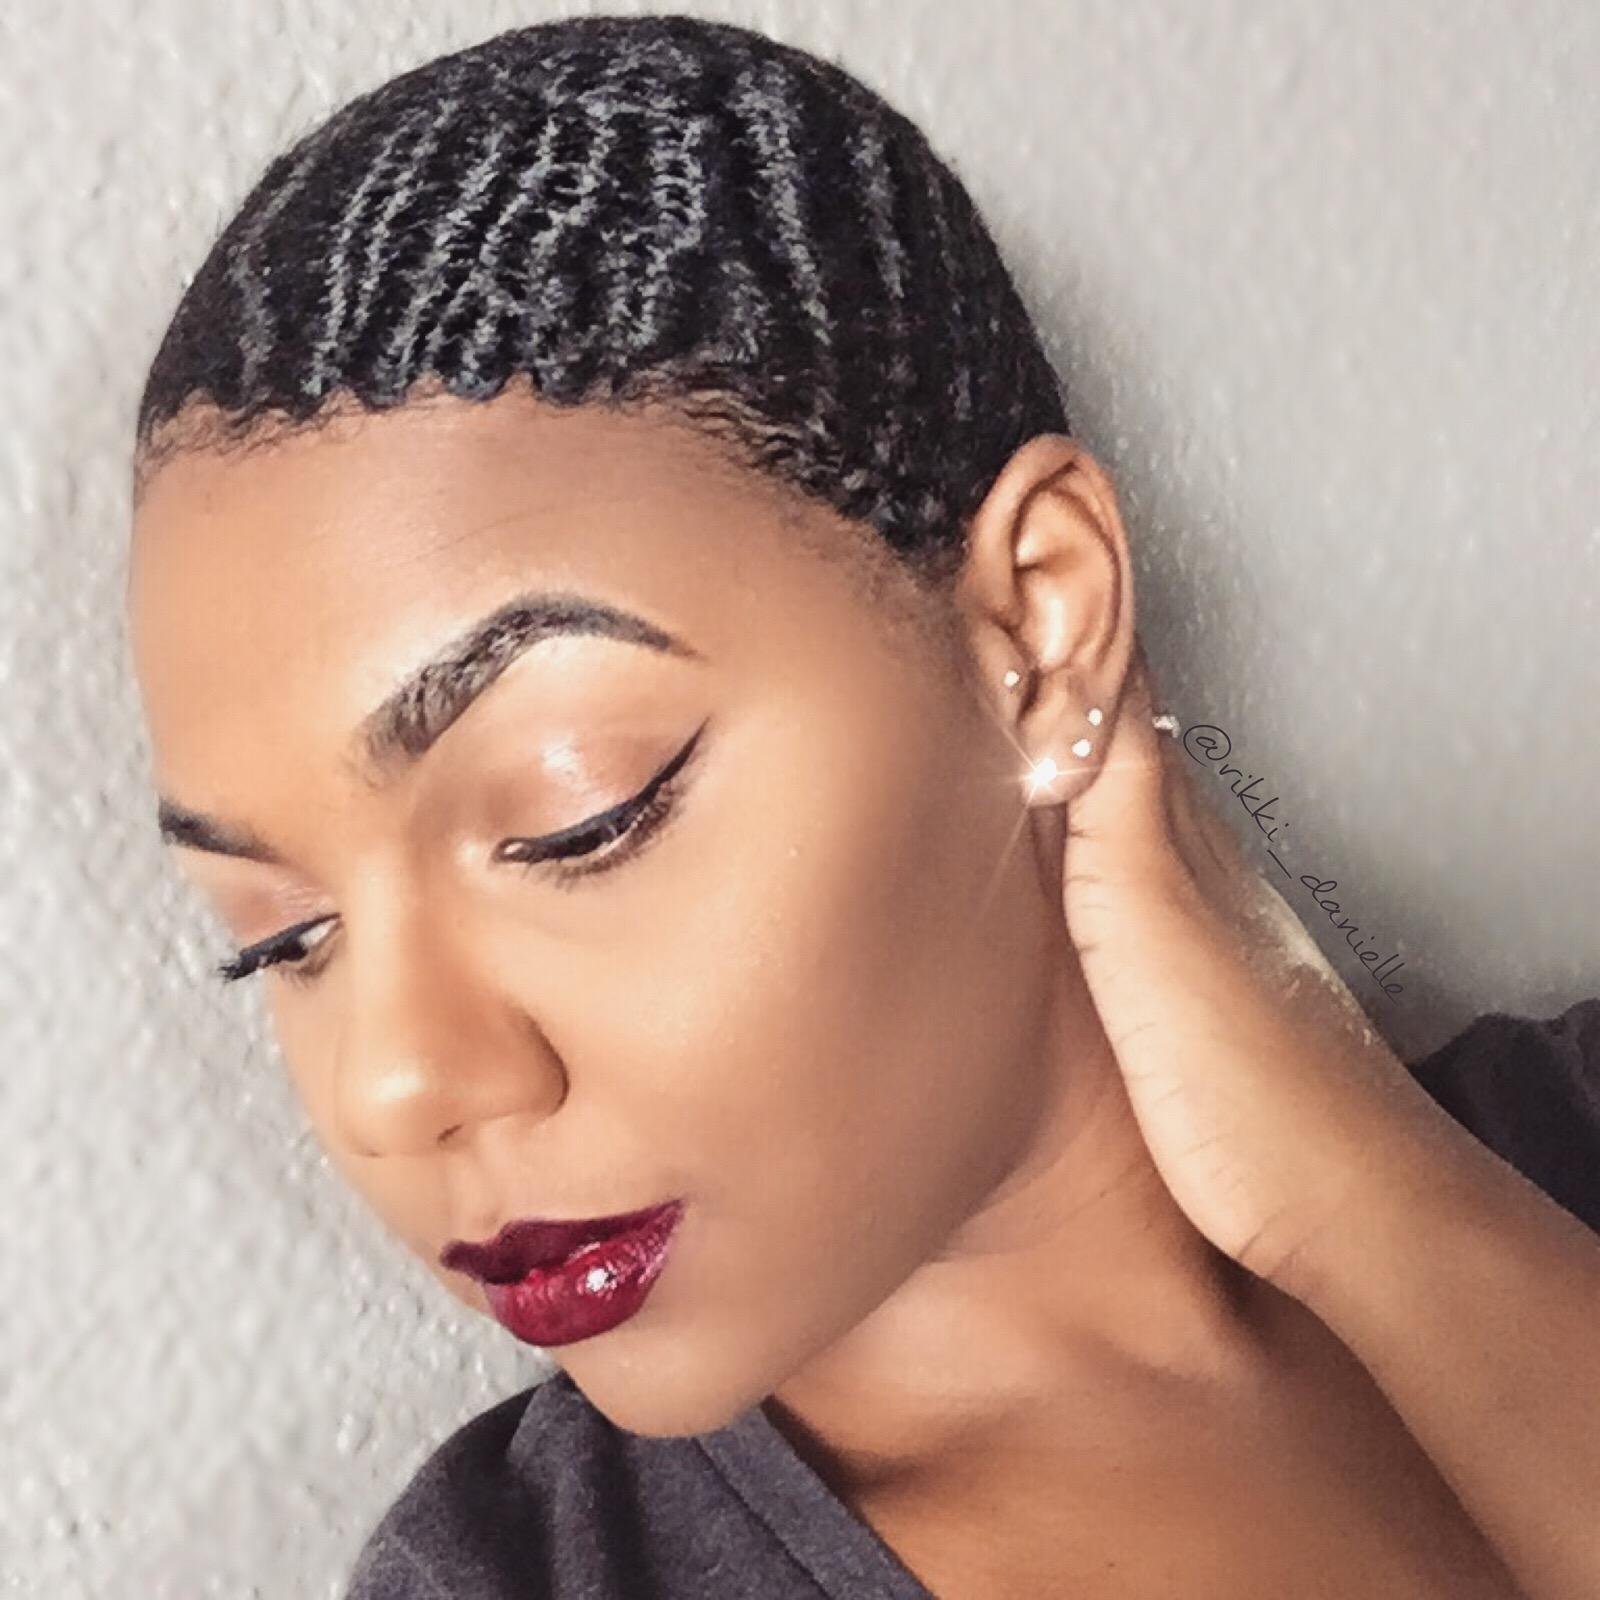 Hairstyle Kansas City : ... Kansas City // 3C/4A Natural Hair Icon Black Girl with Long Hair